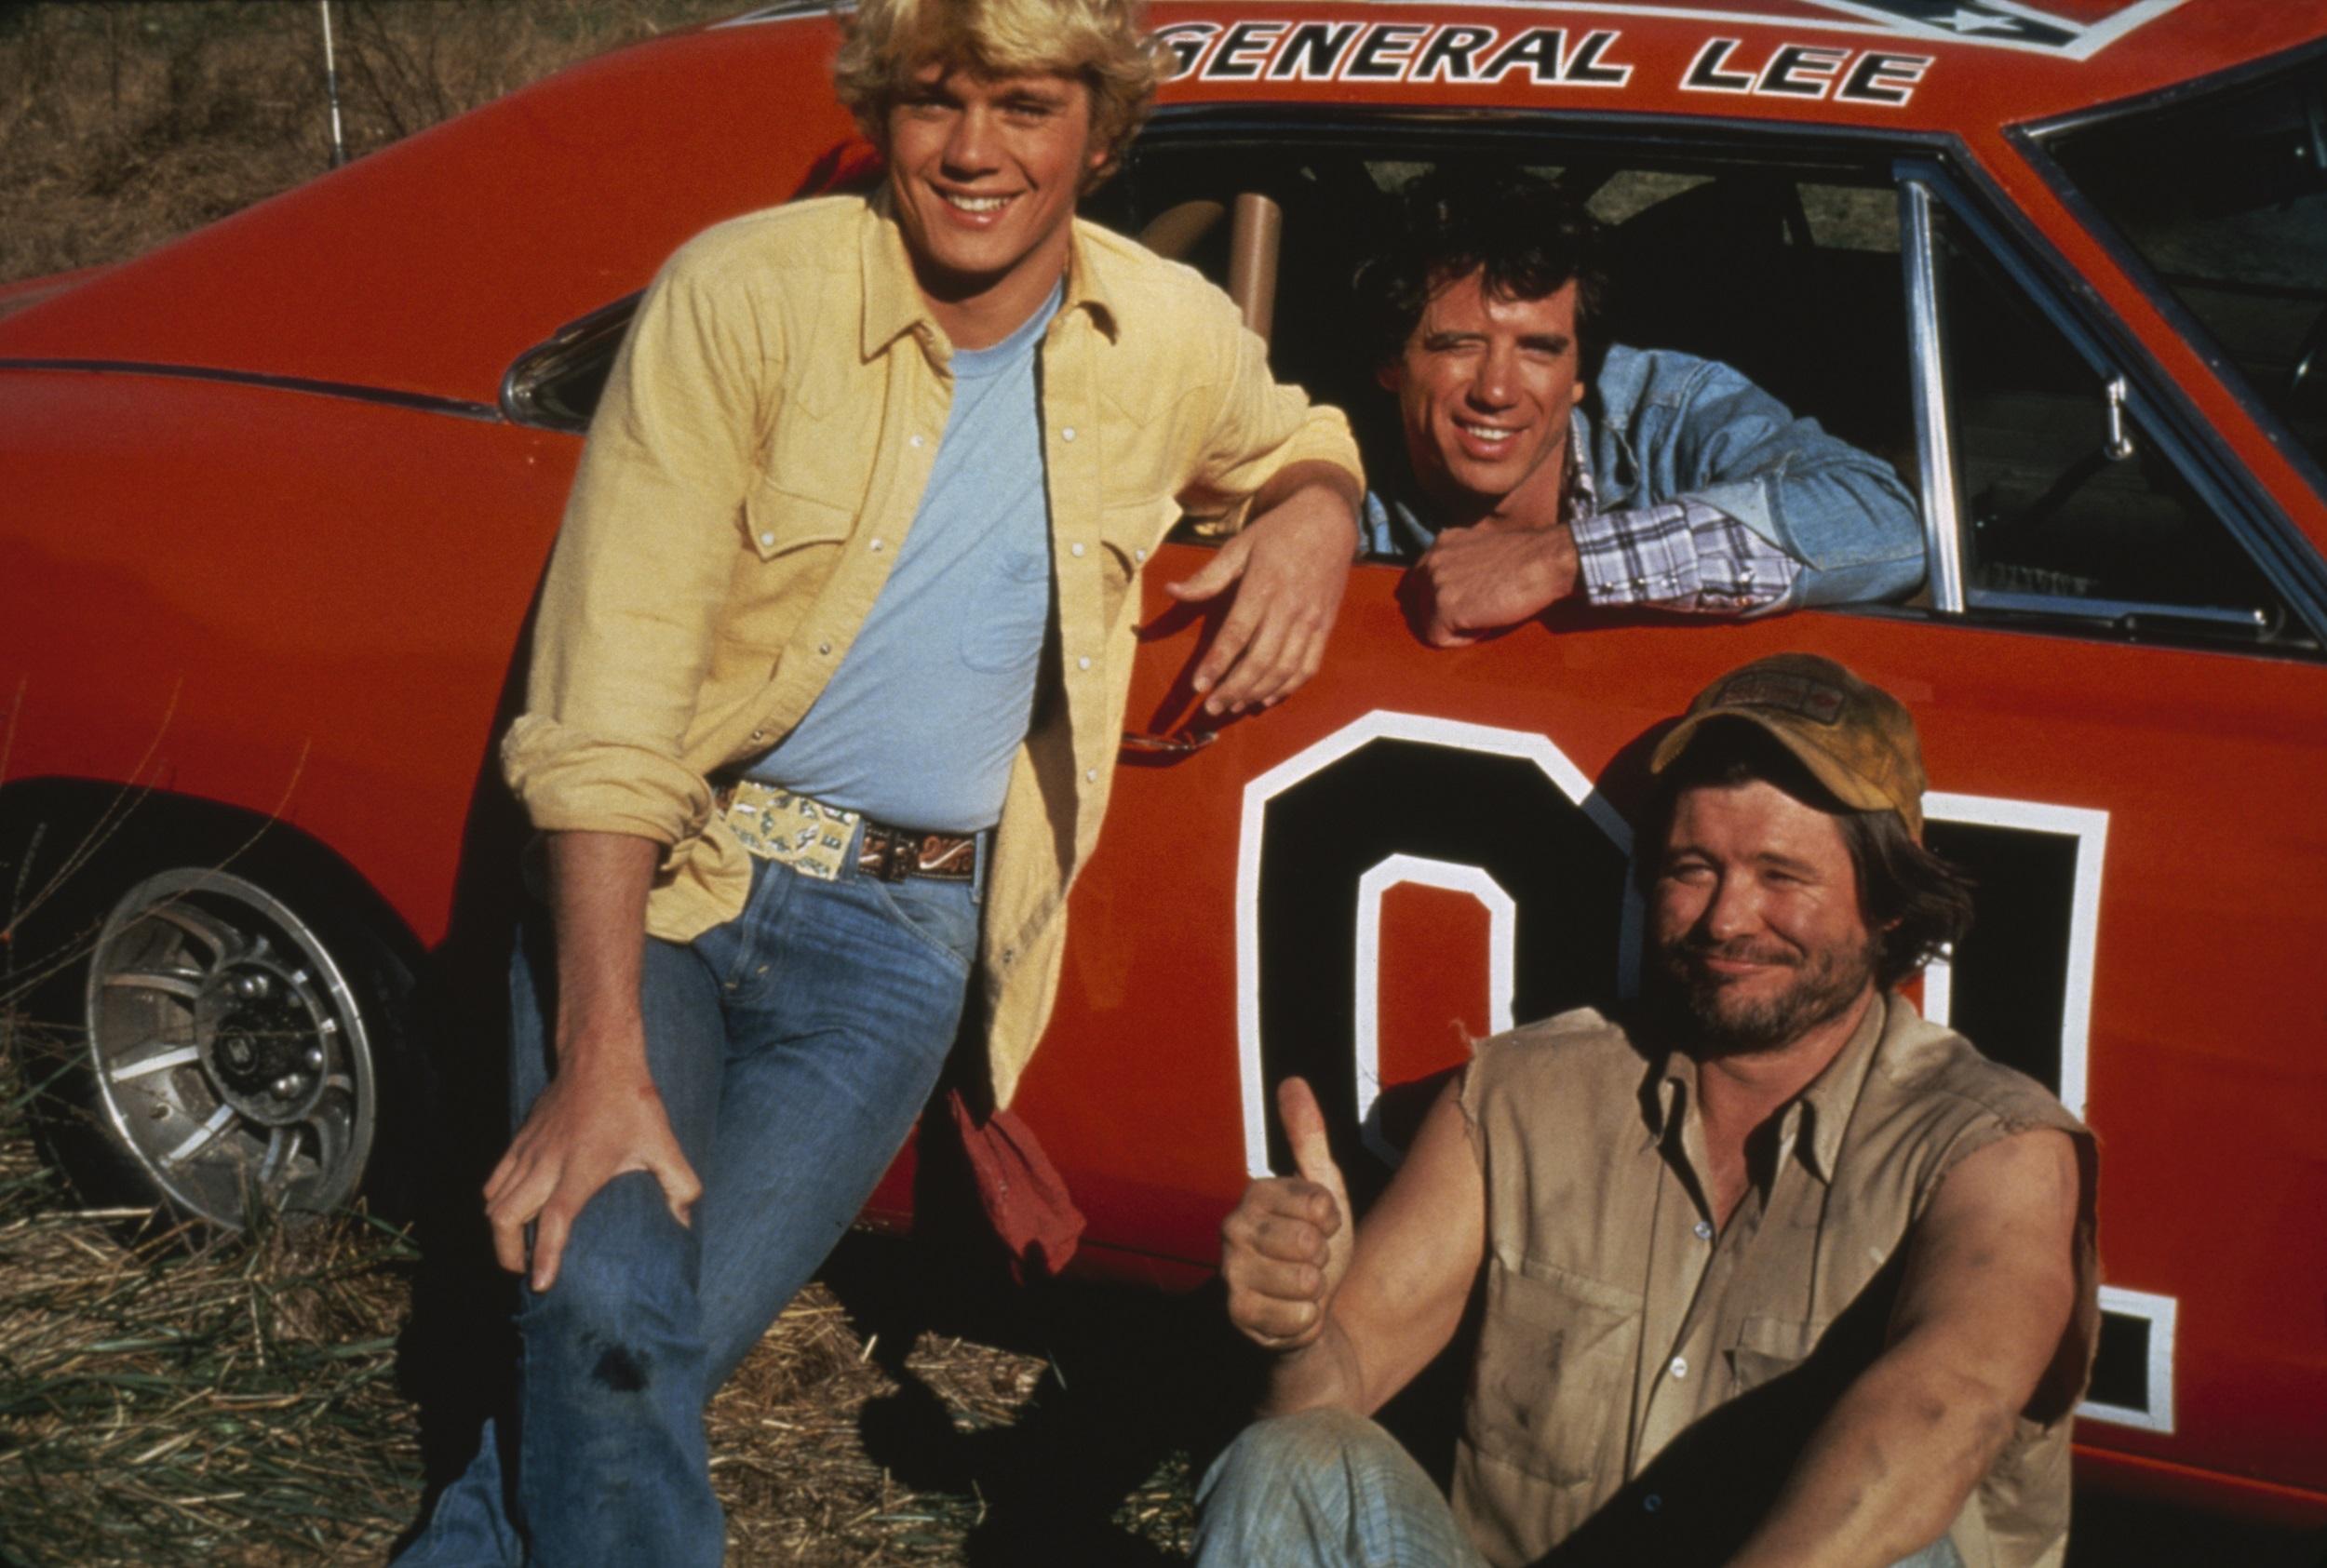 John Schneider, Tom Wopat, and Ben Jones with the General Lee car